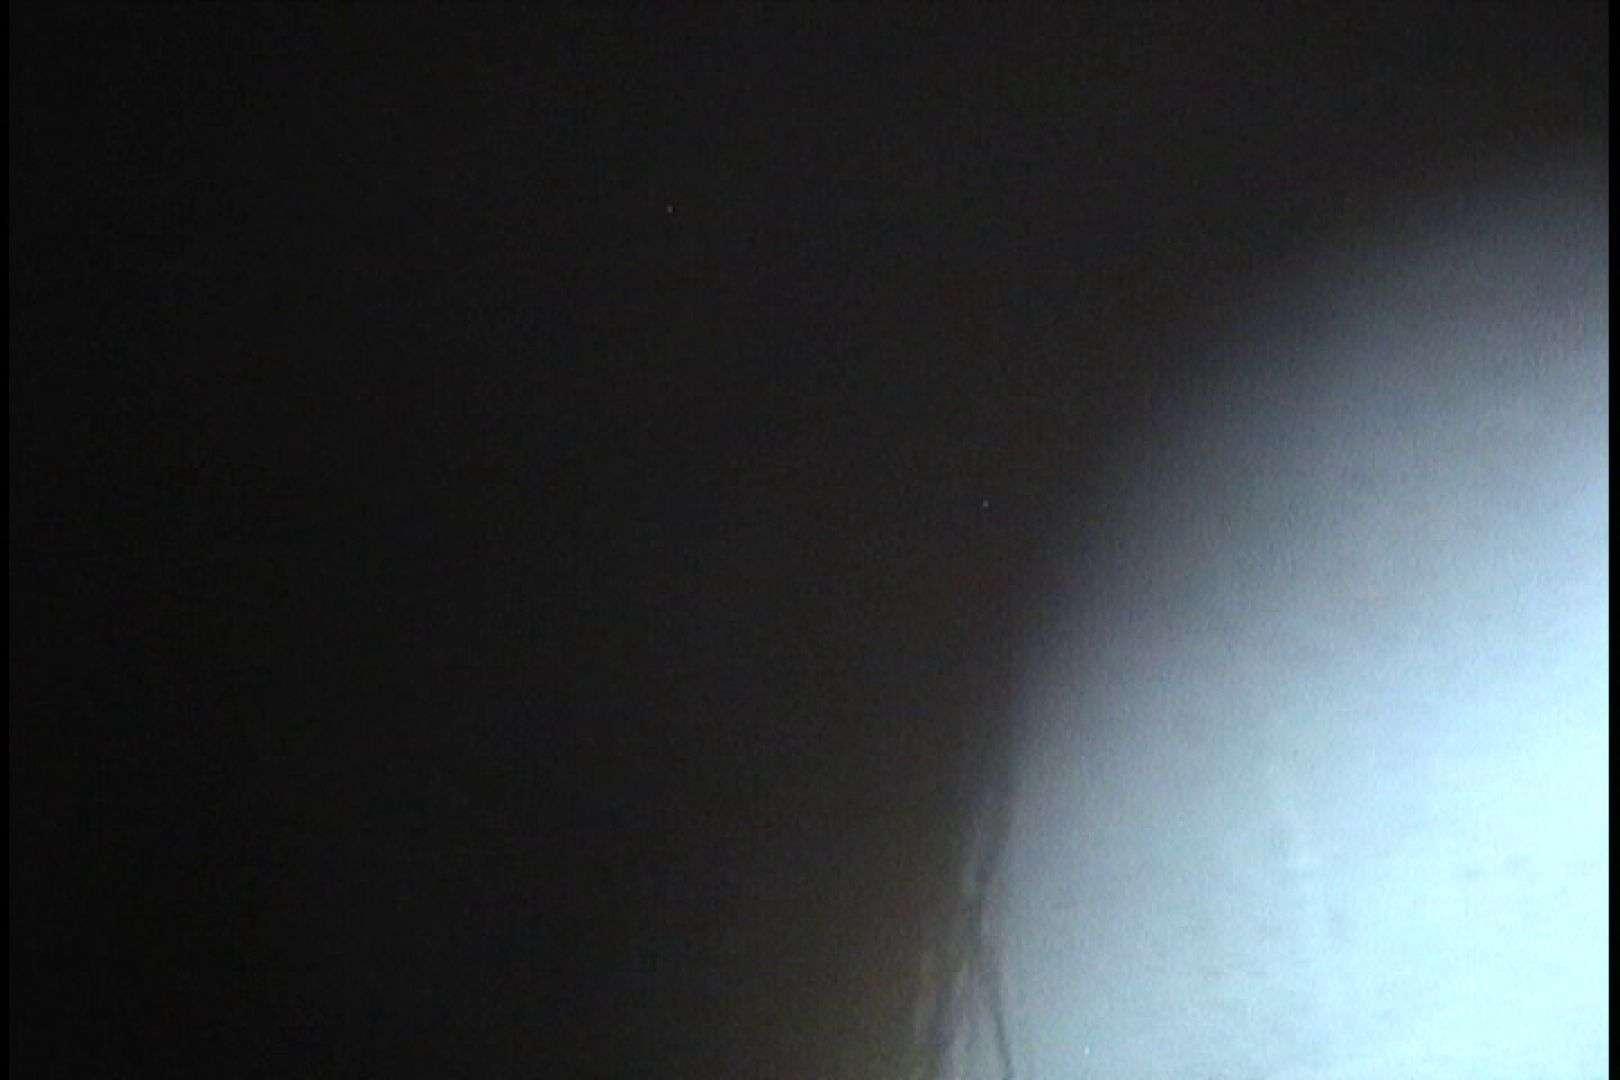 No.83 色白と日焼け跡のコントラストが卑猥 シャワー室 SEX無修正画像 108画像 95